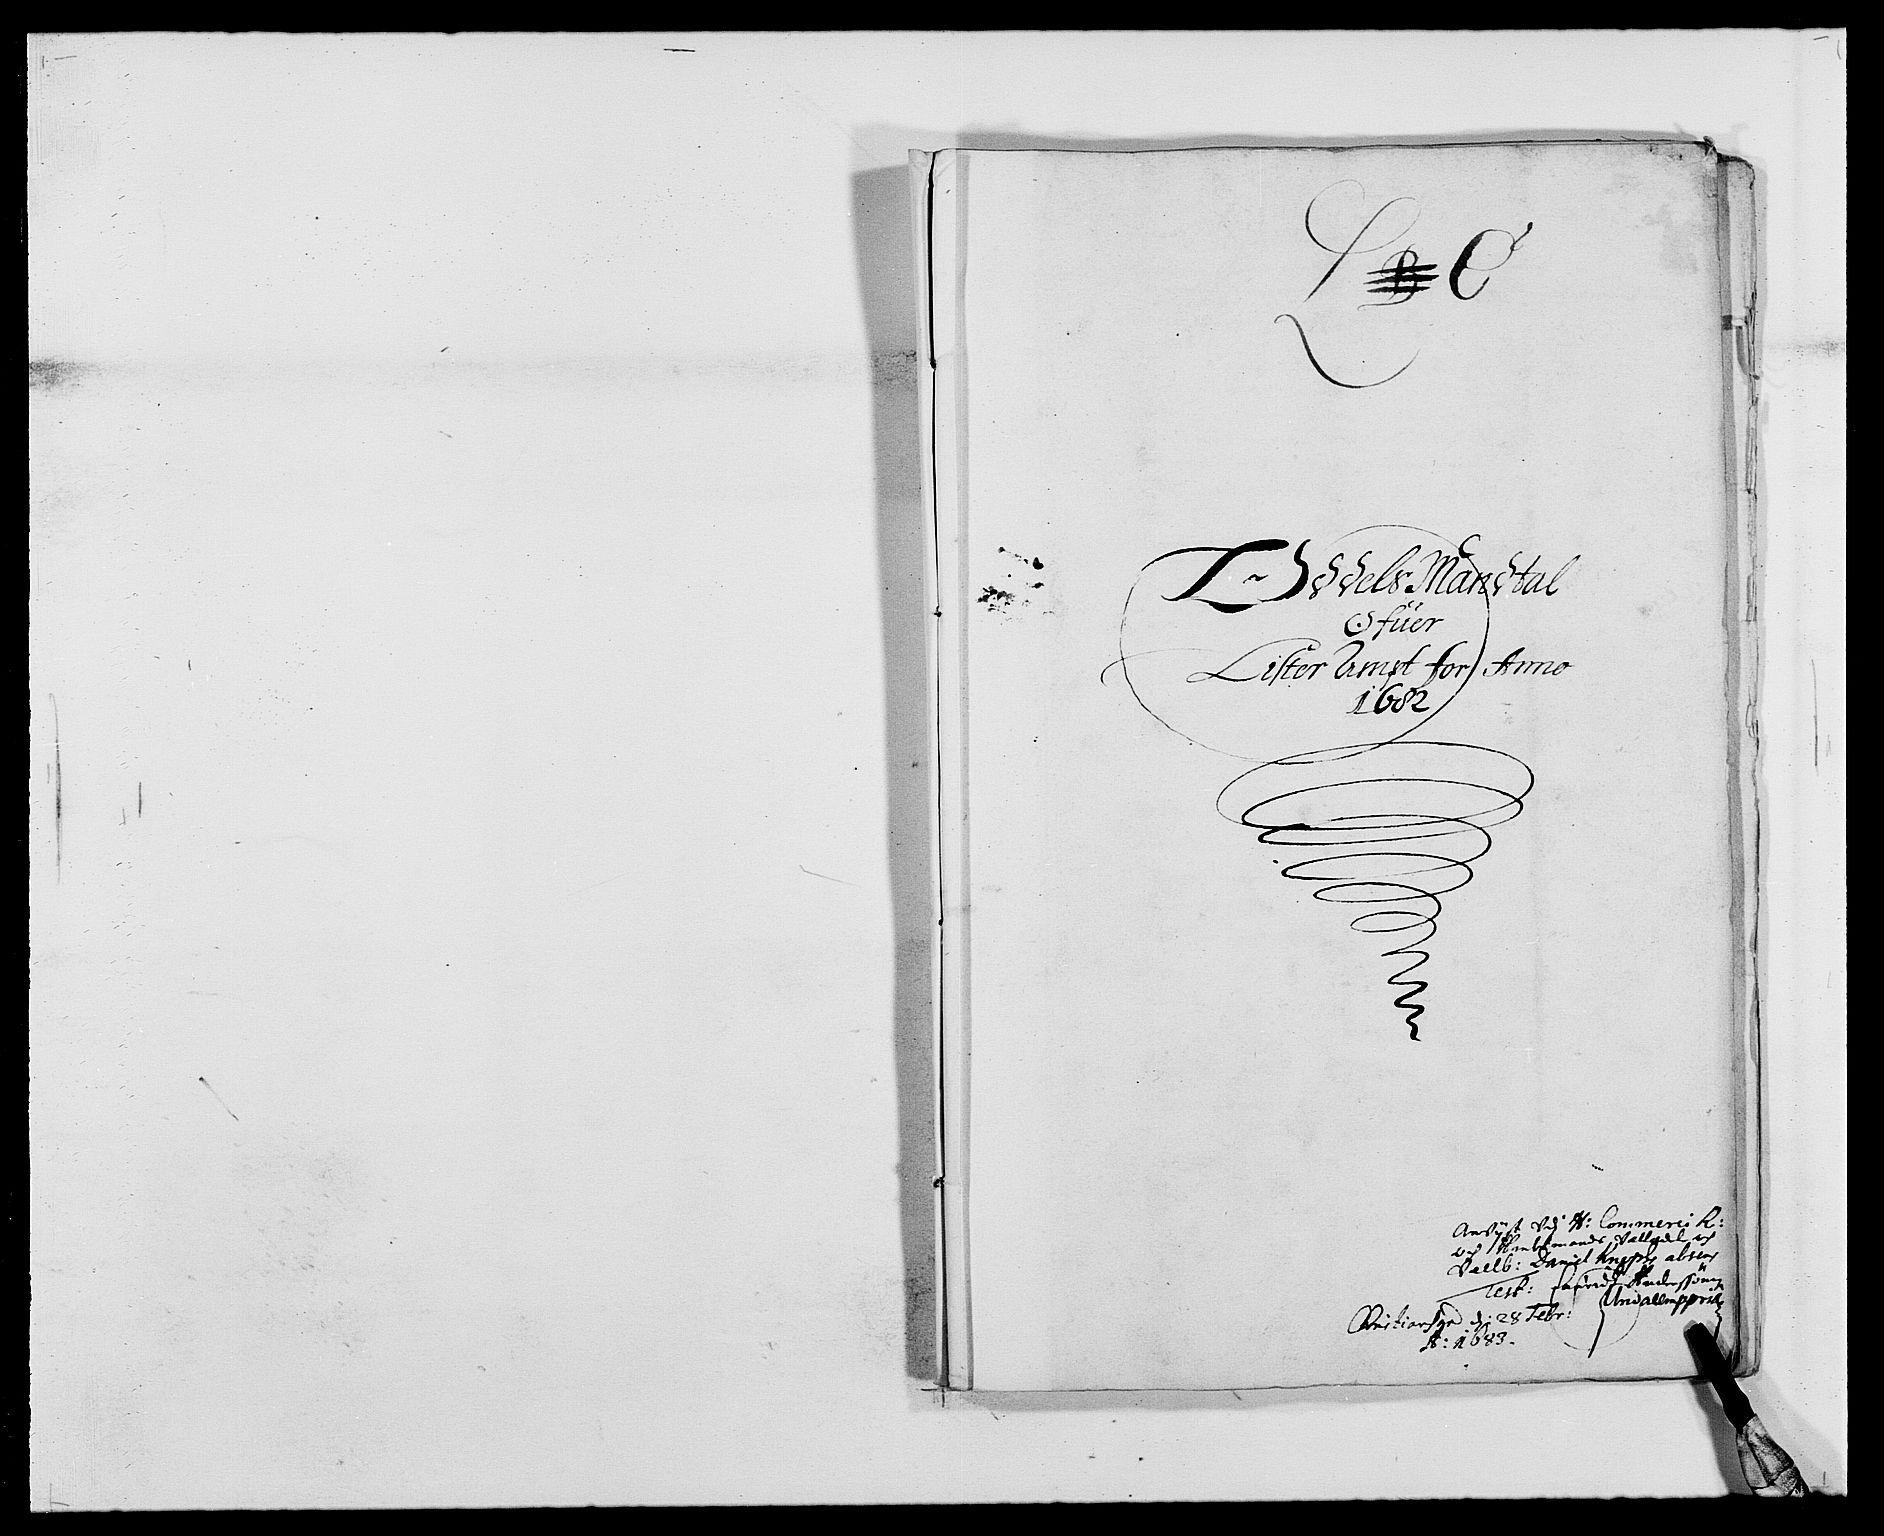 RA, Rentekammeret inntil 1814, Reviderte regnskaper, Fogderegnskap, R41/L2531: Fogderegnskap Lista, 1680-1682, s. 182